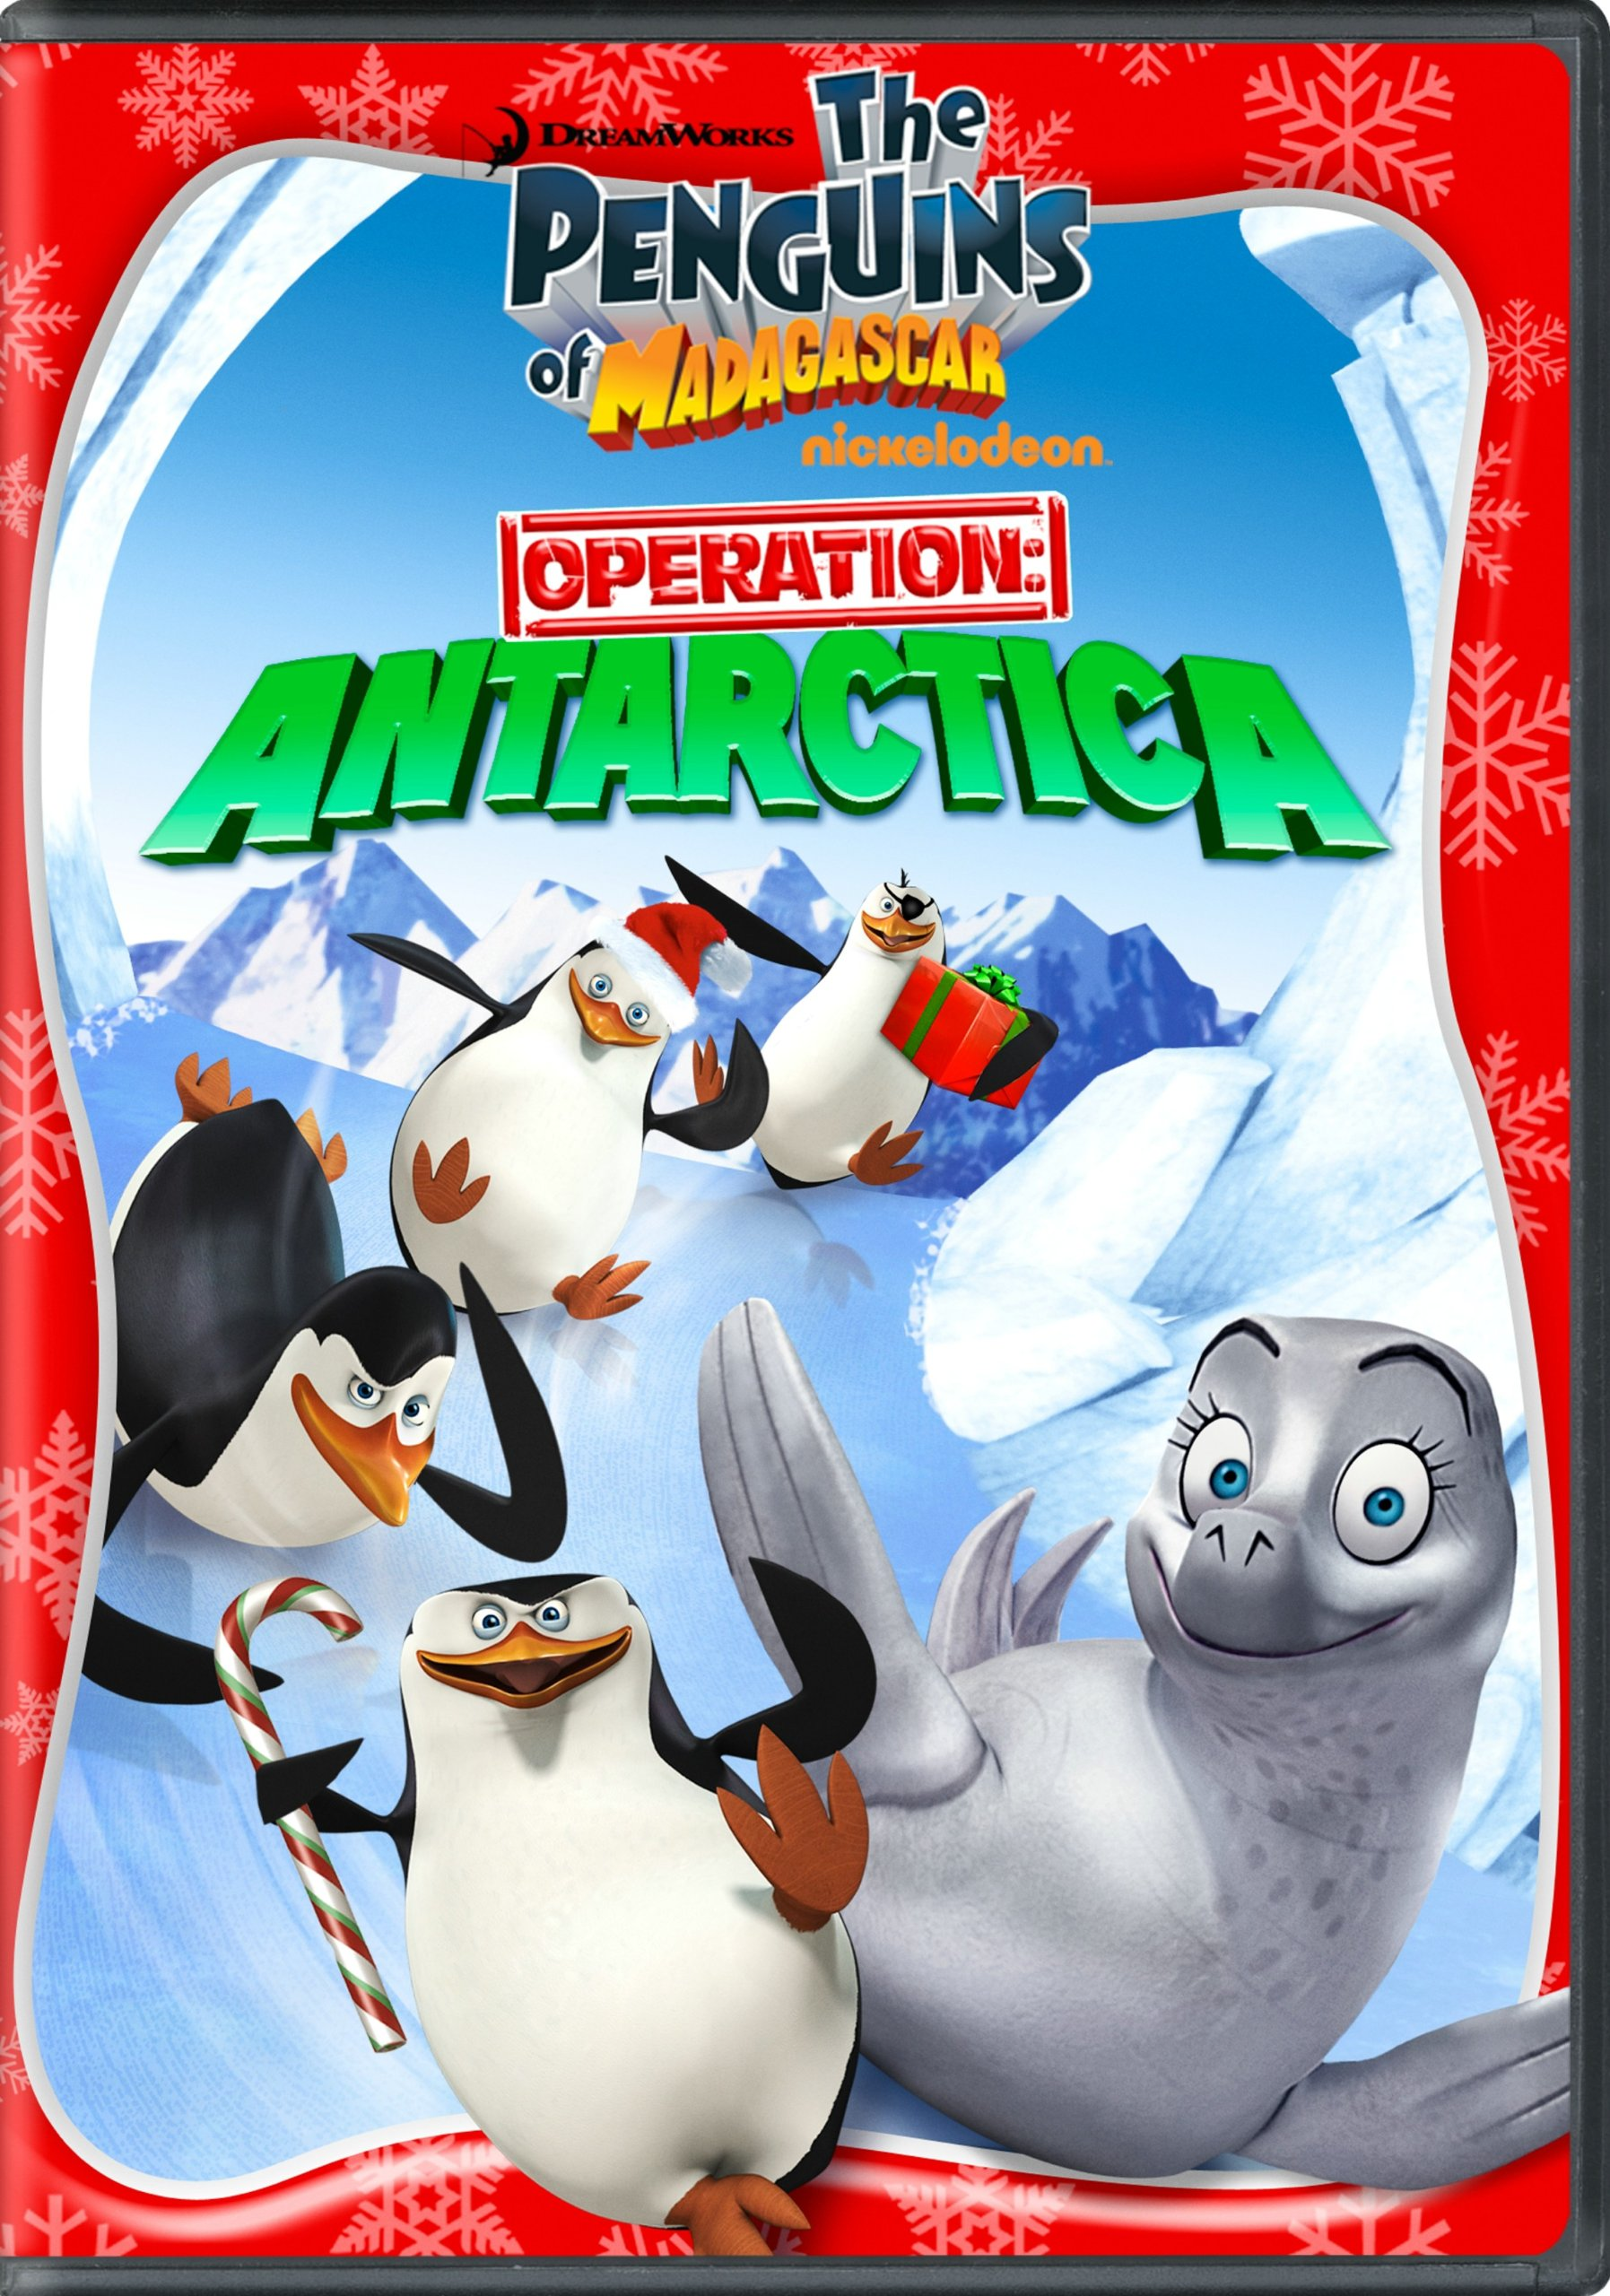 The Penguins of Madagascar: Operation Antarctica